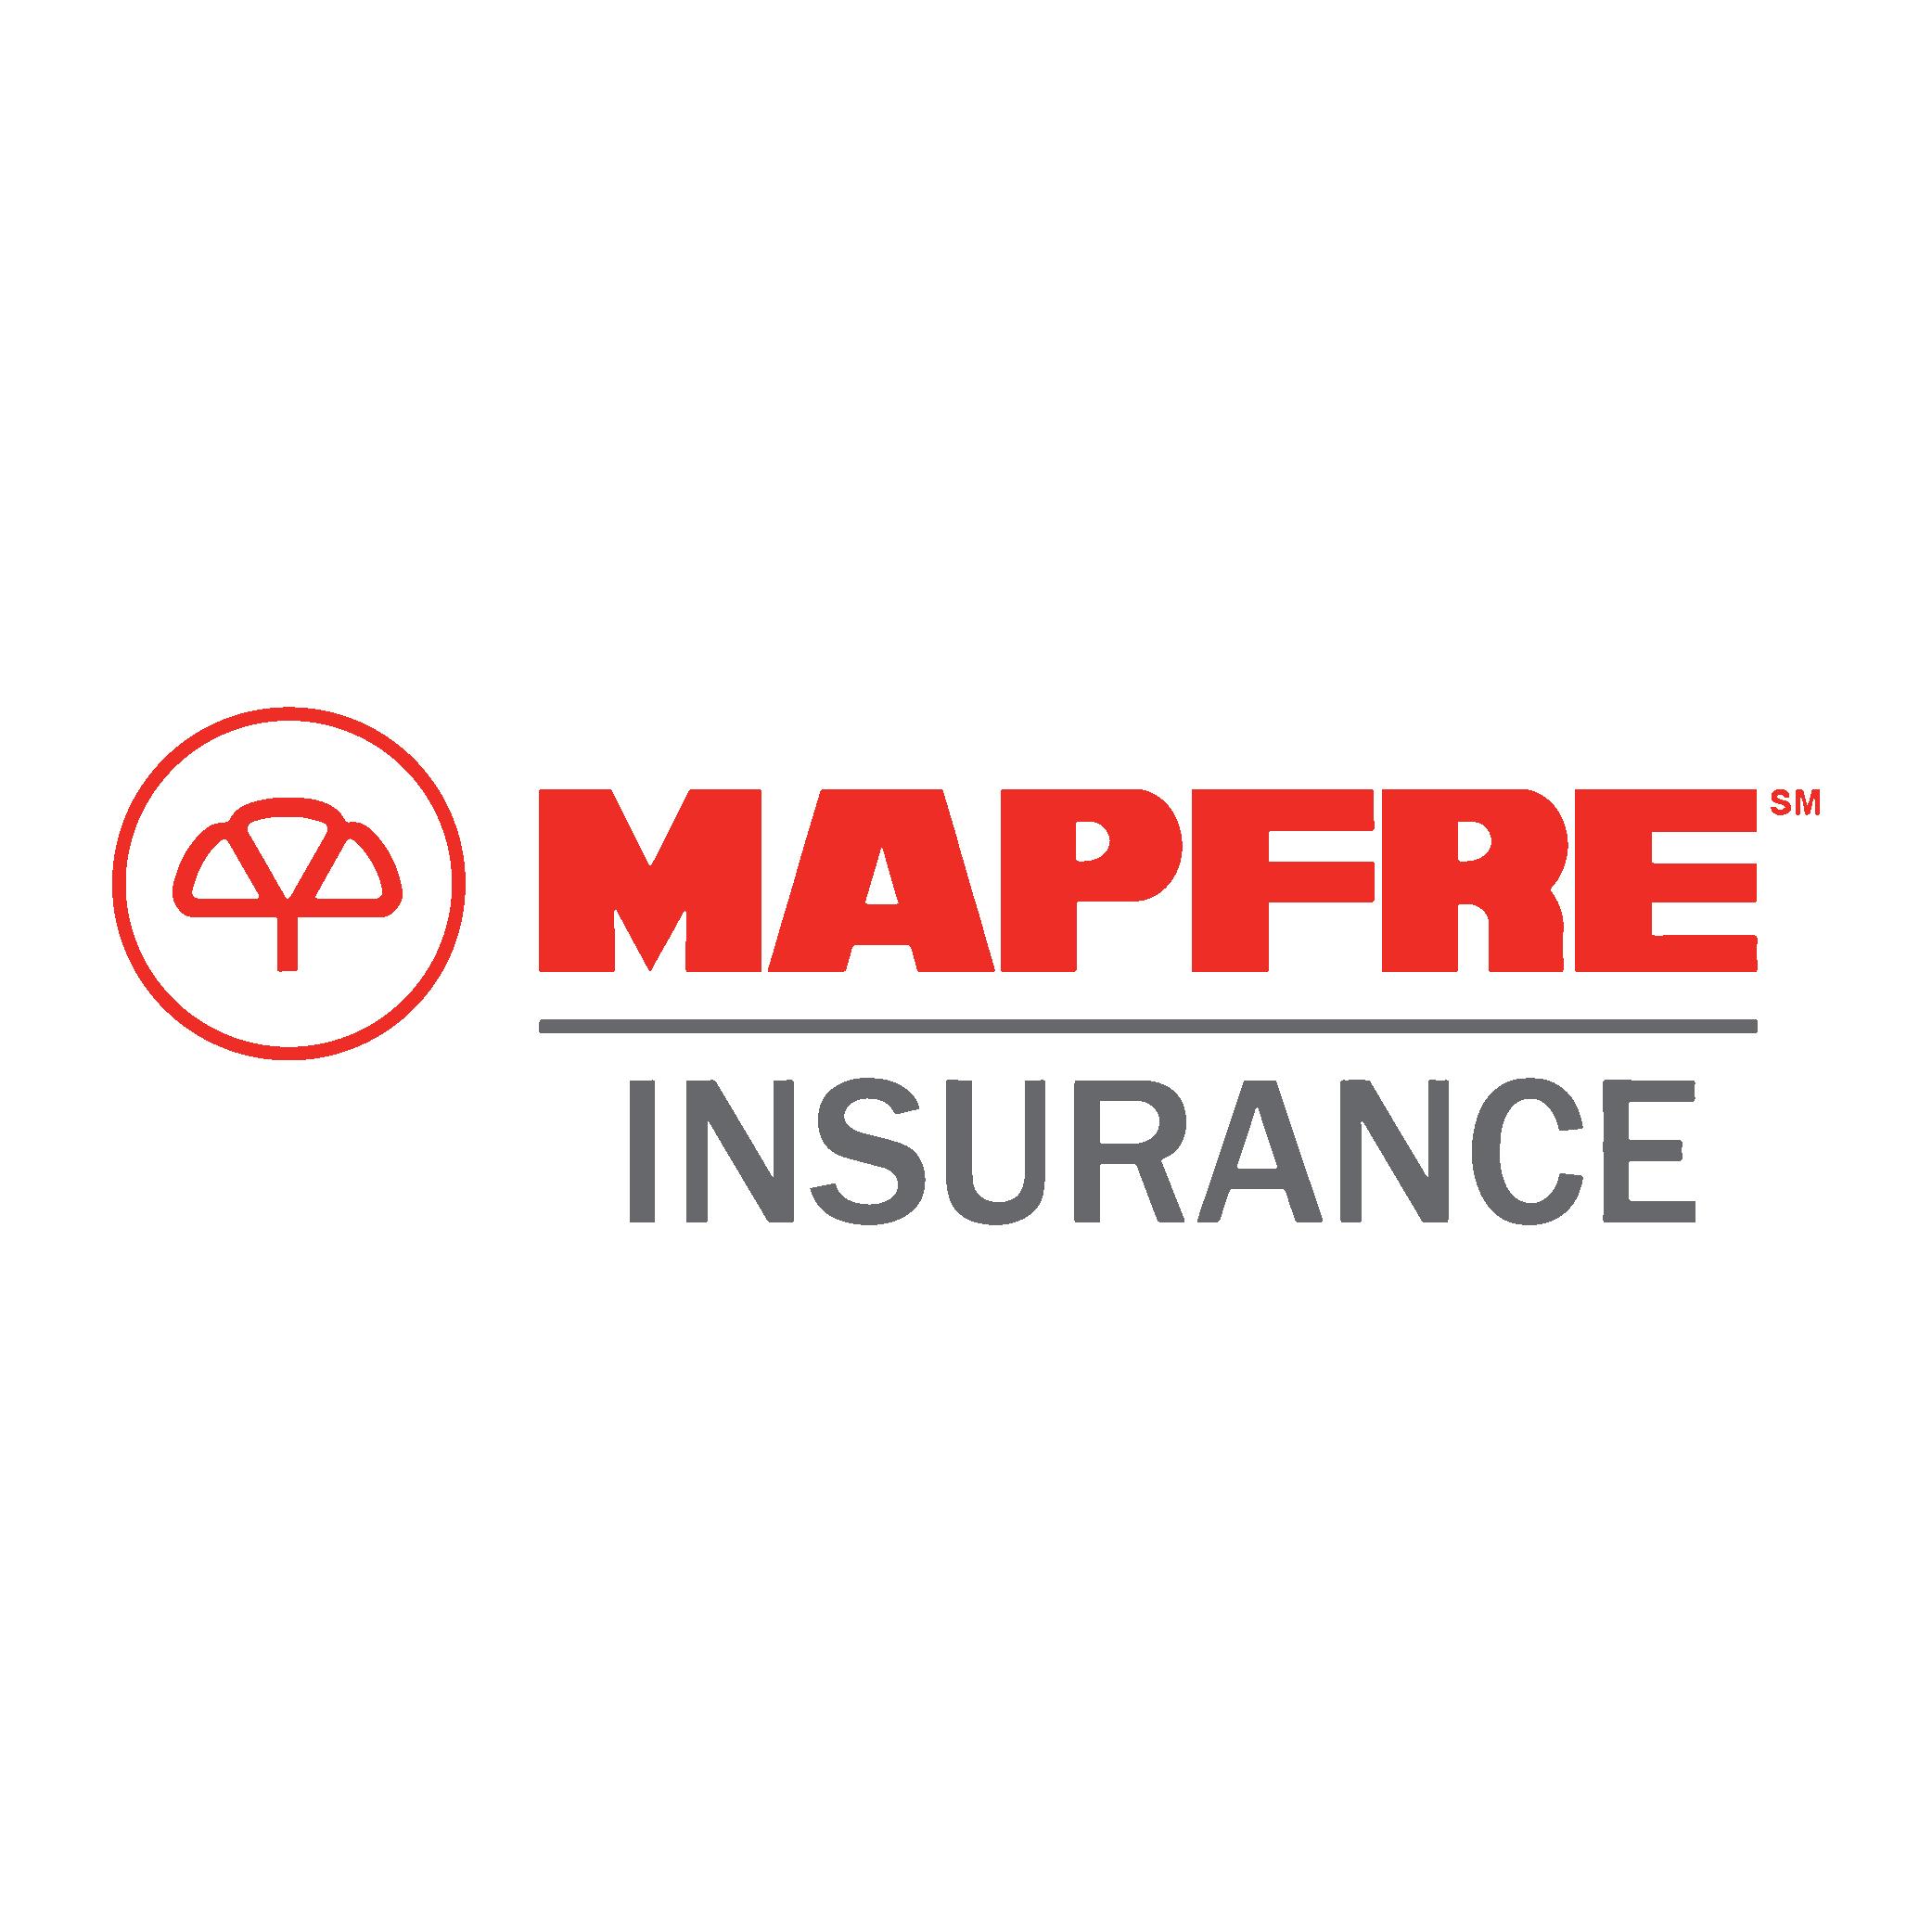 GAD Insurance Carrier Logos-16.png